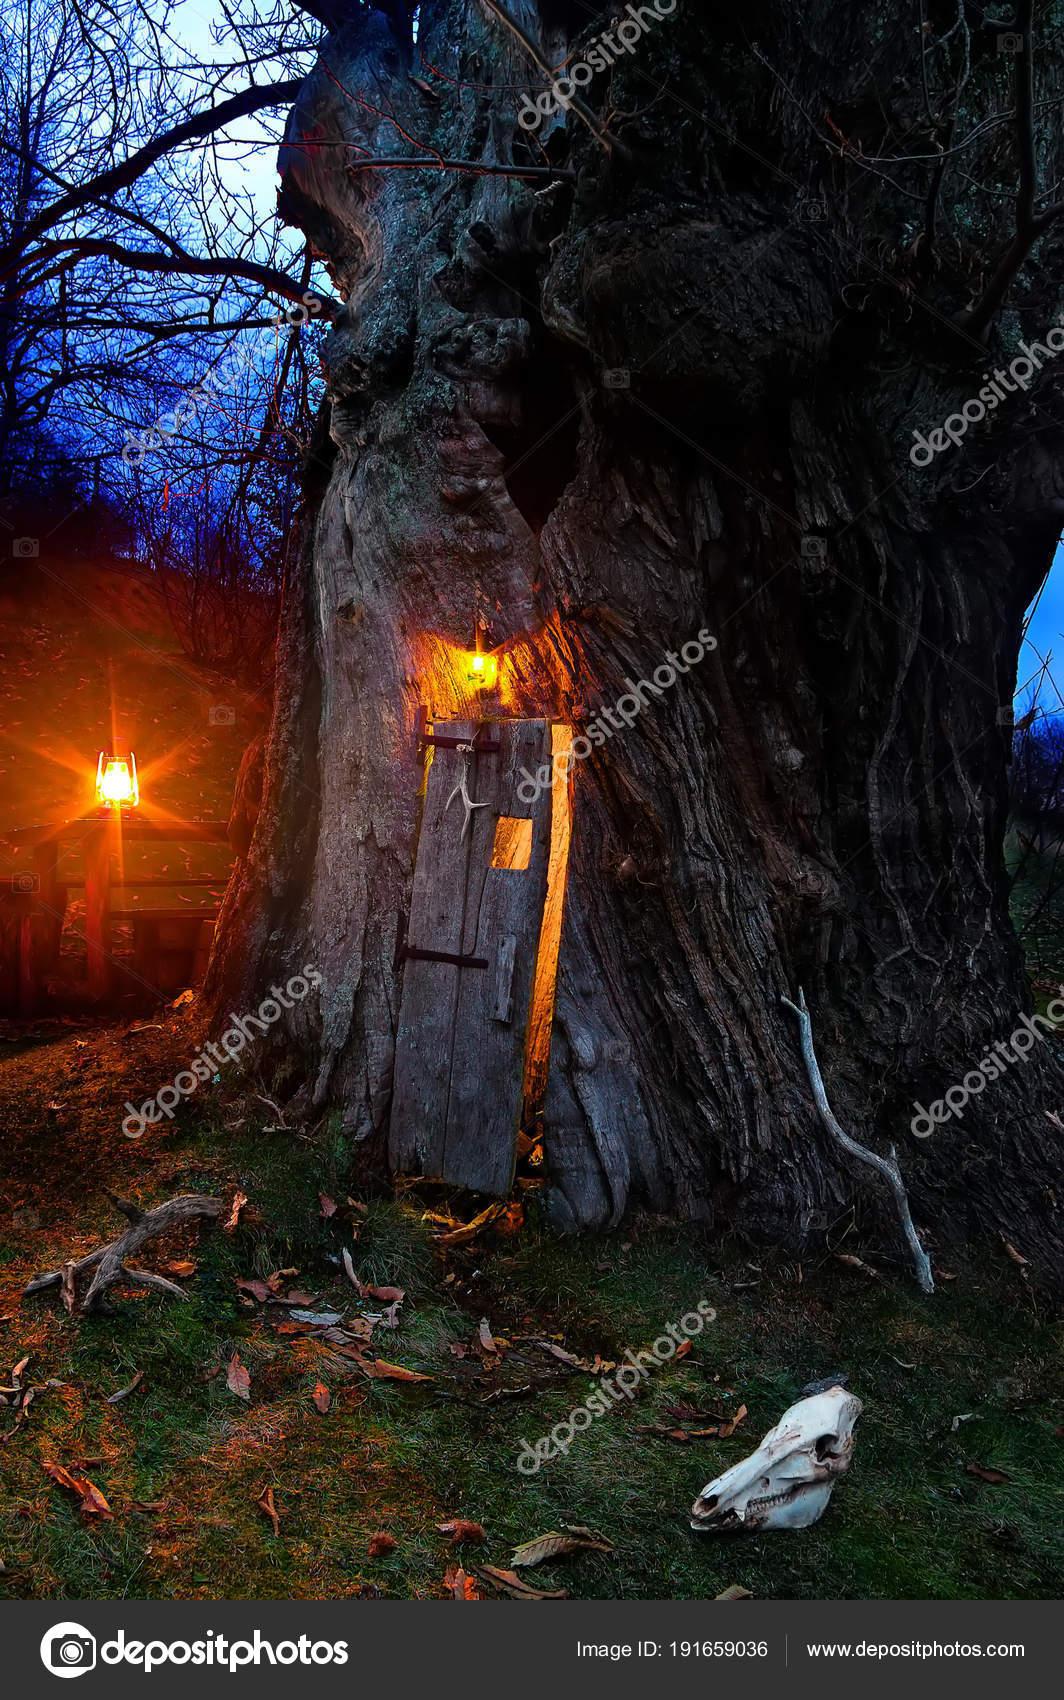 Casa Degli Elfi Questo Enorme Secolare Castagno Con Una